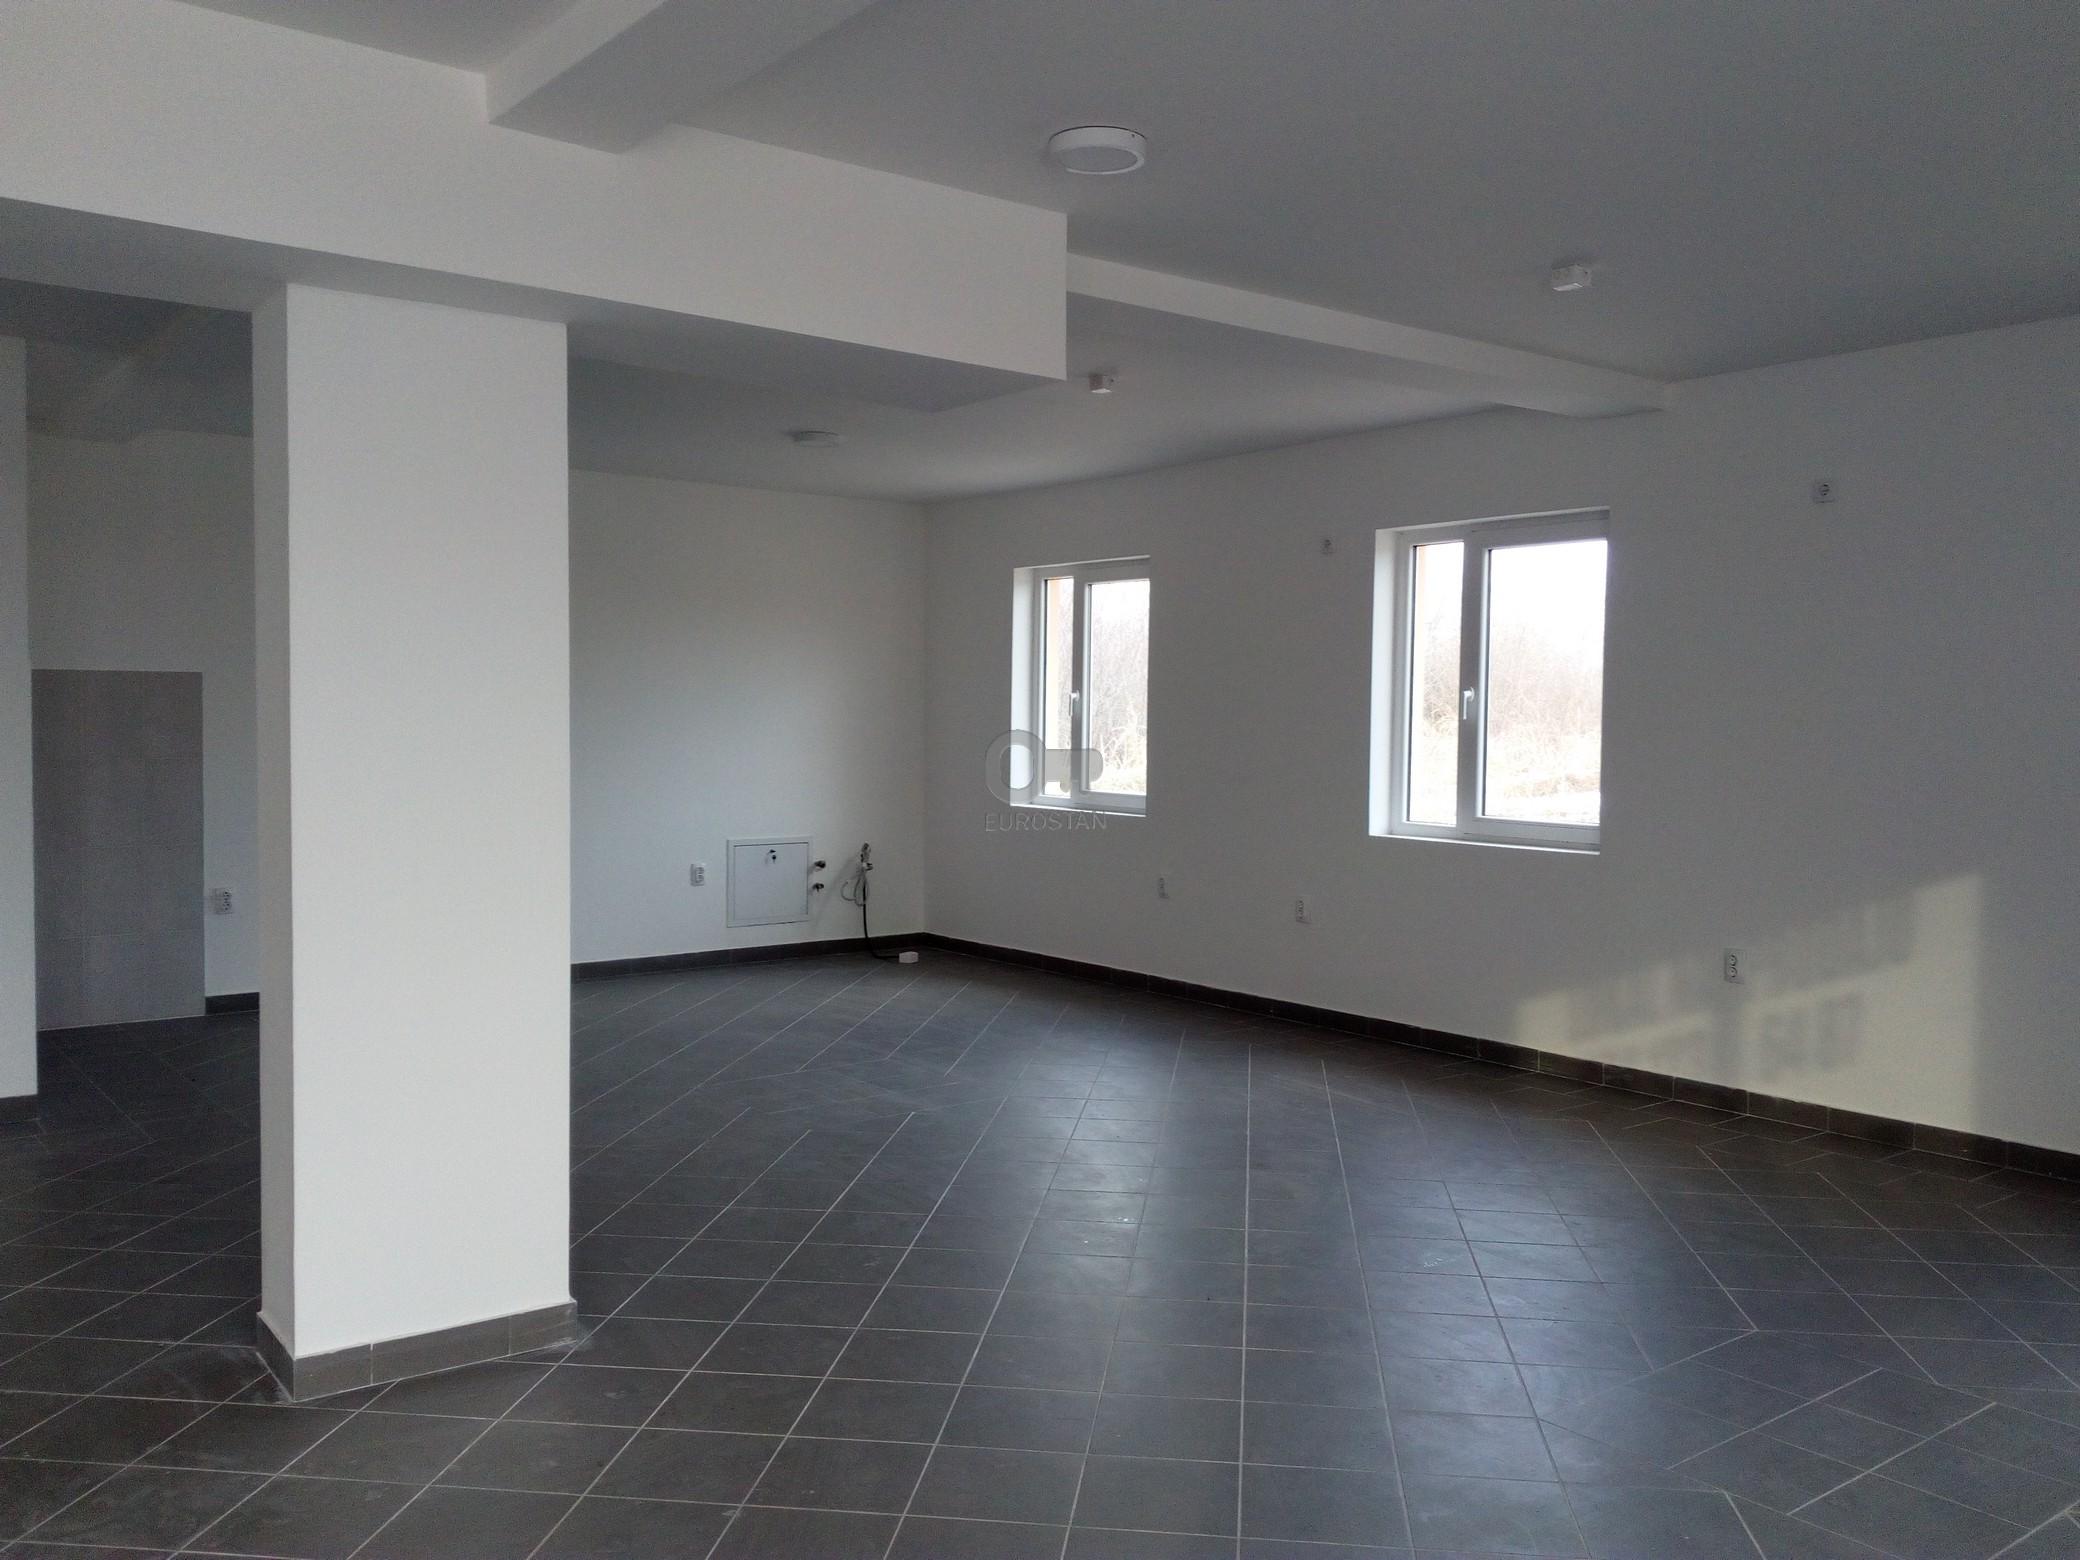 Poslovni prostor SURČIN 56000 EUR